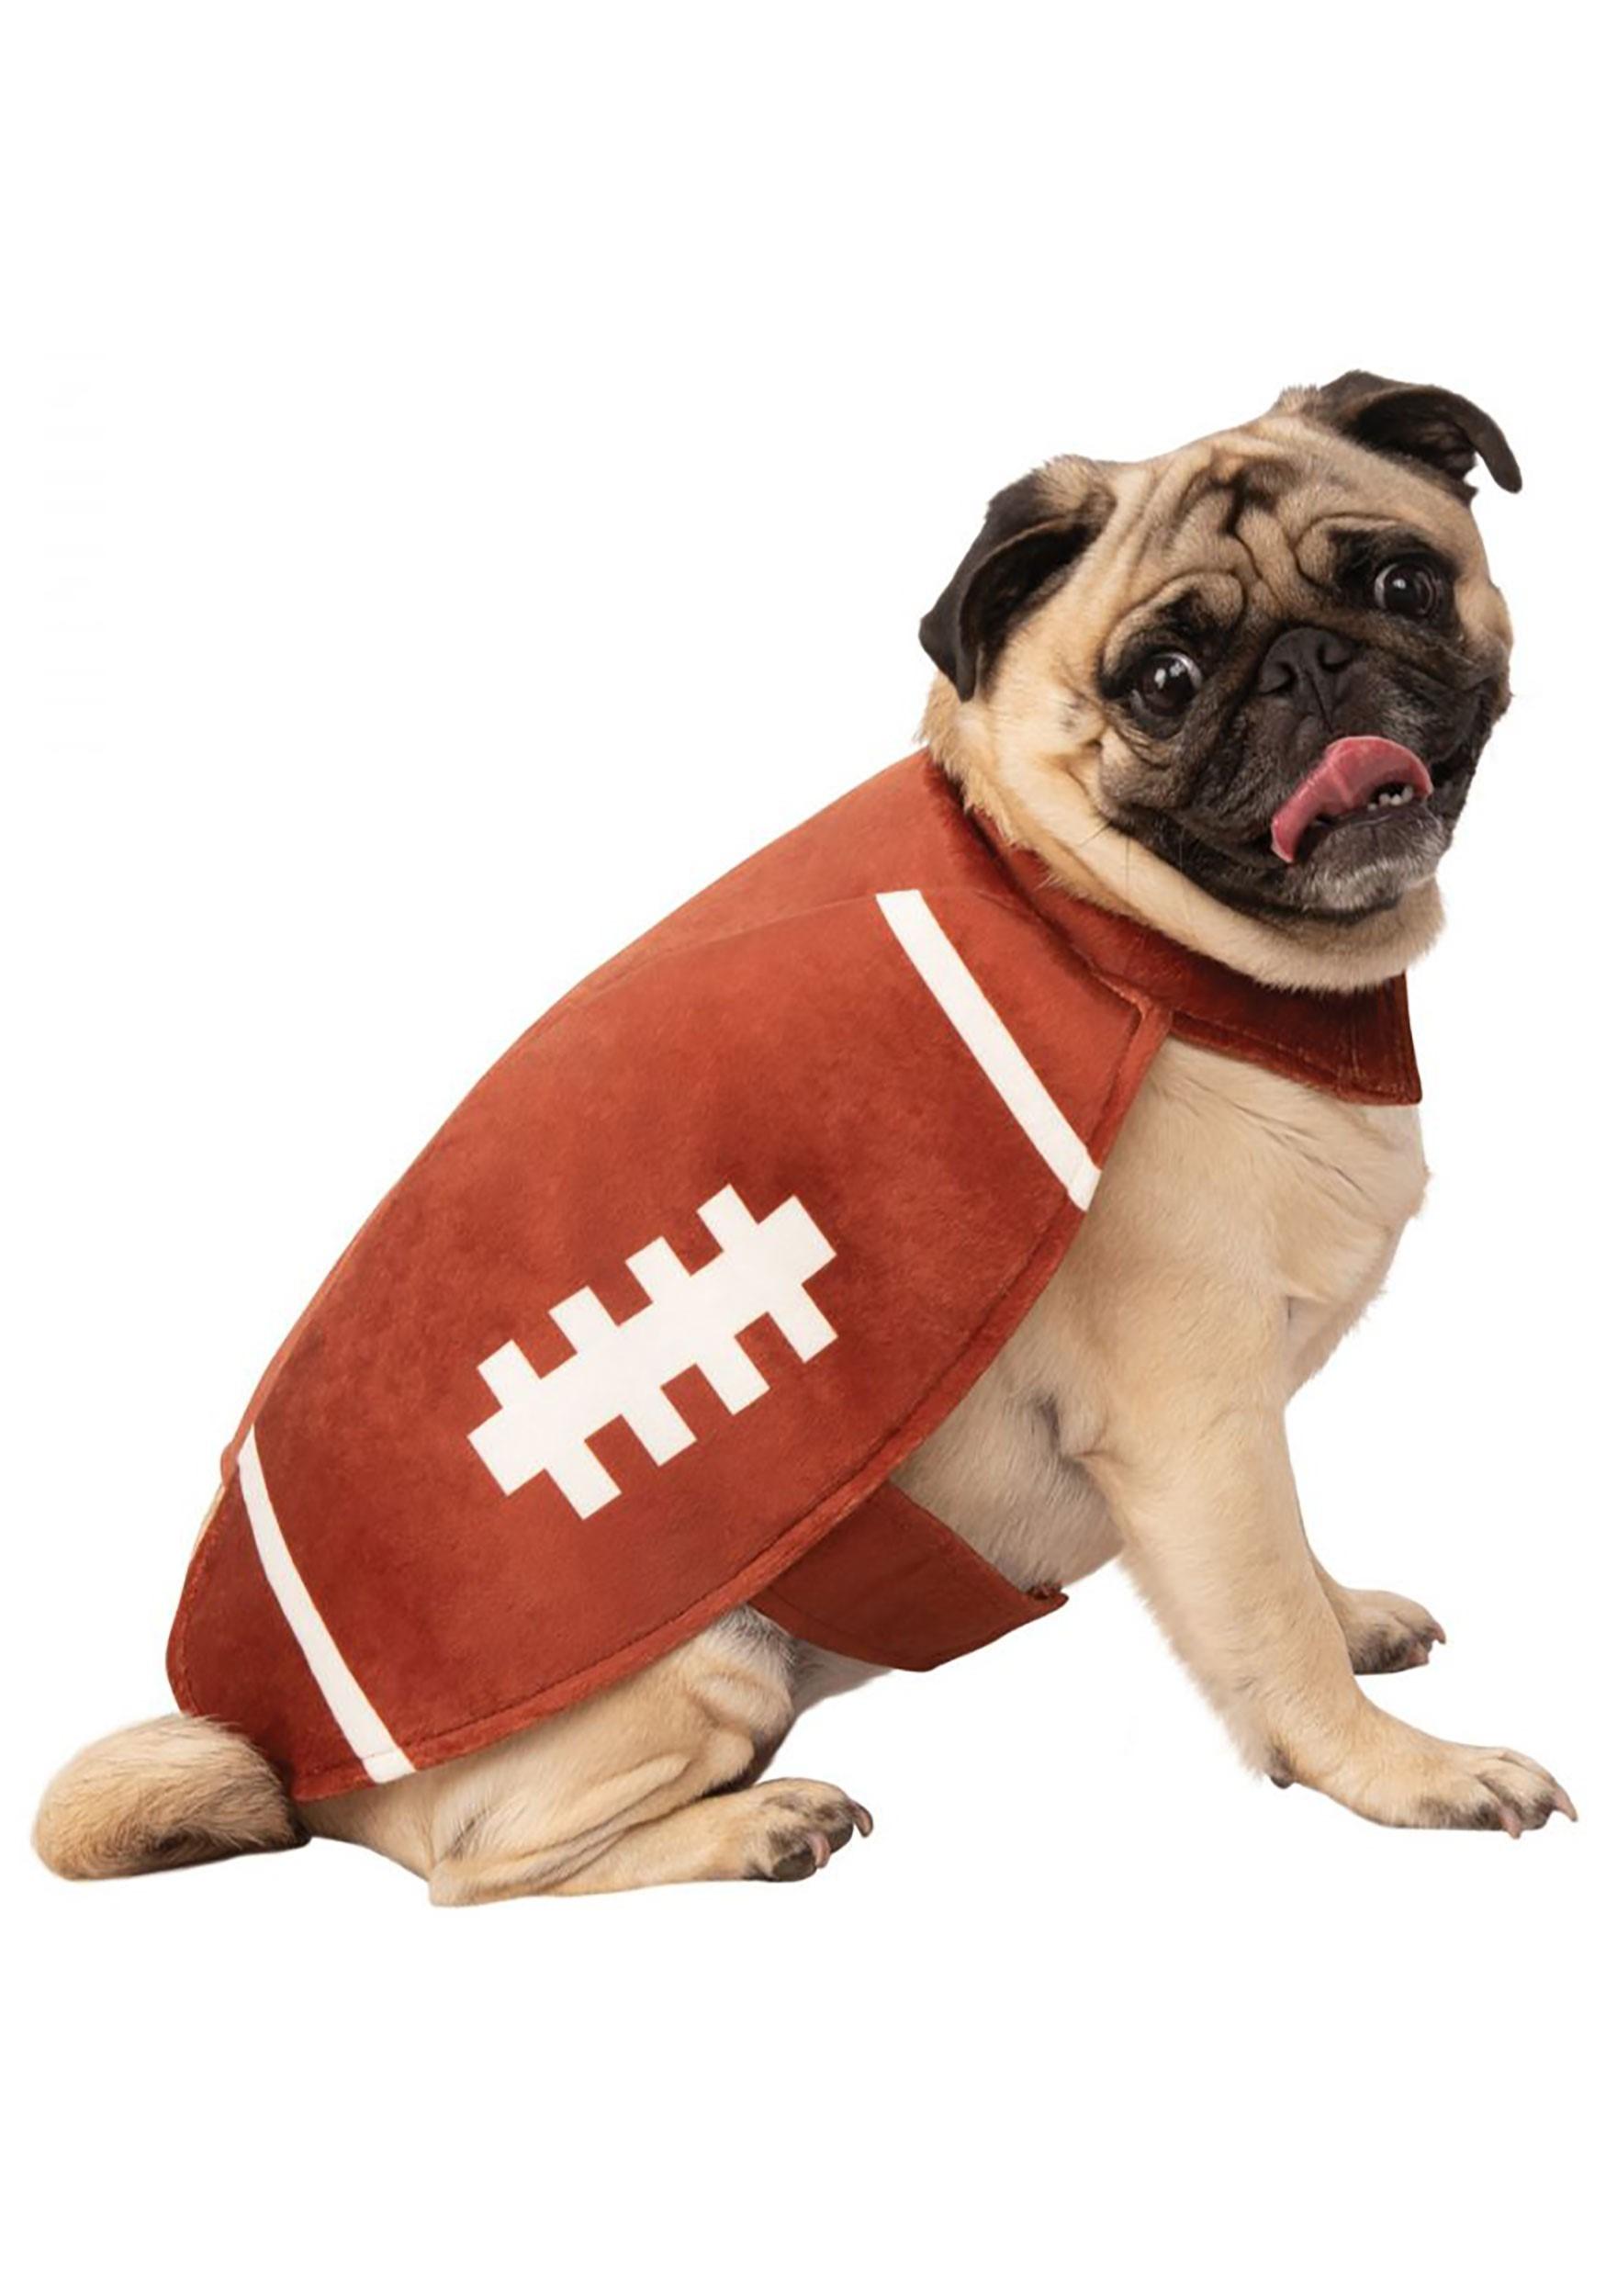 Dog Touchdown Football Costume